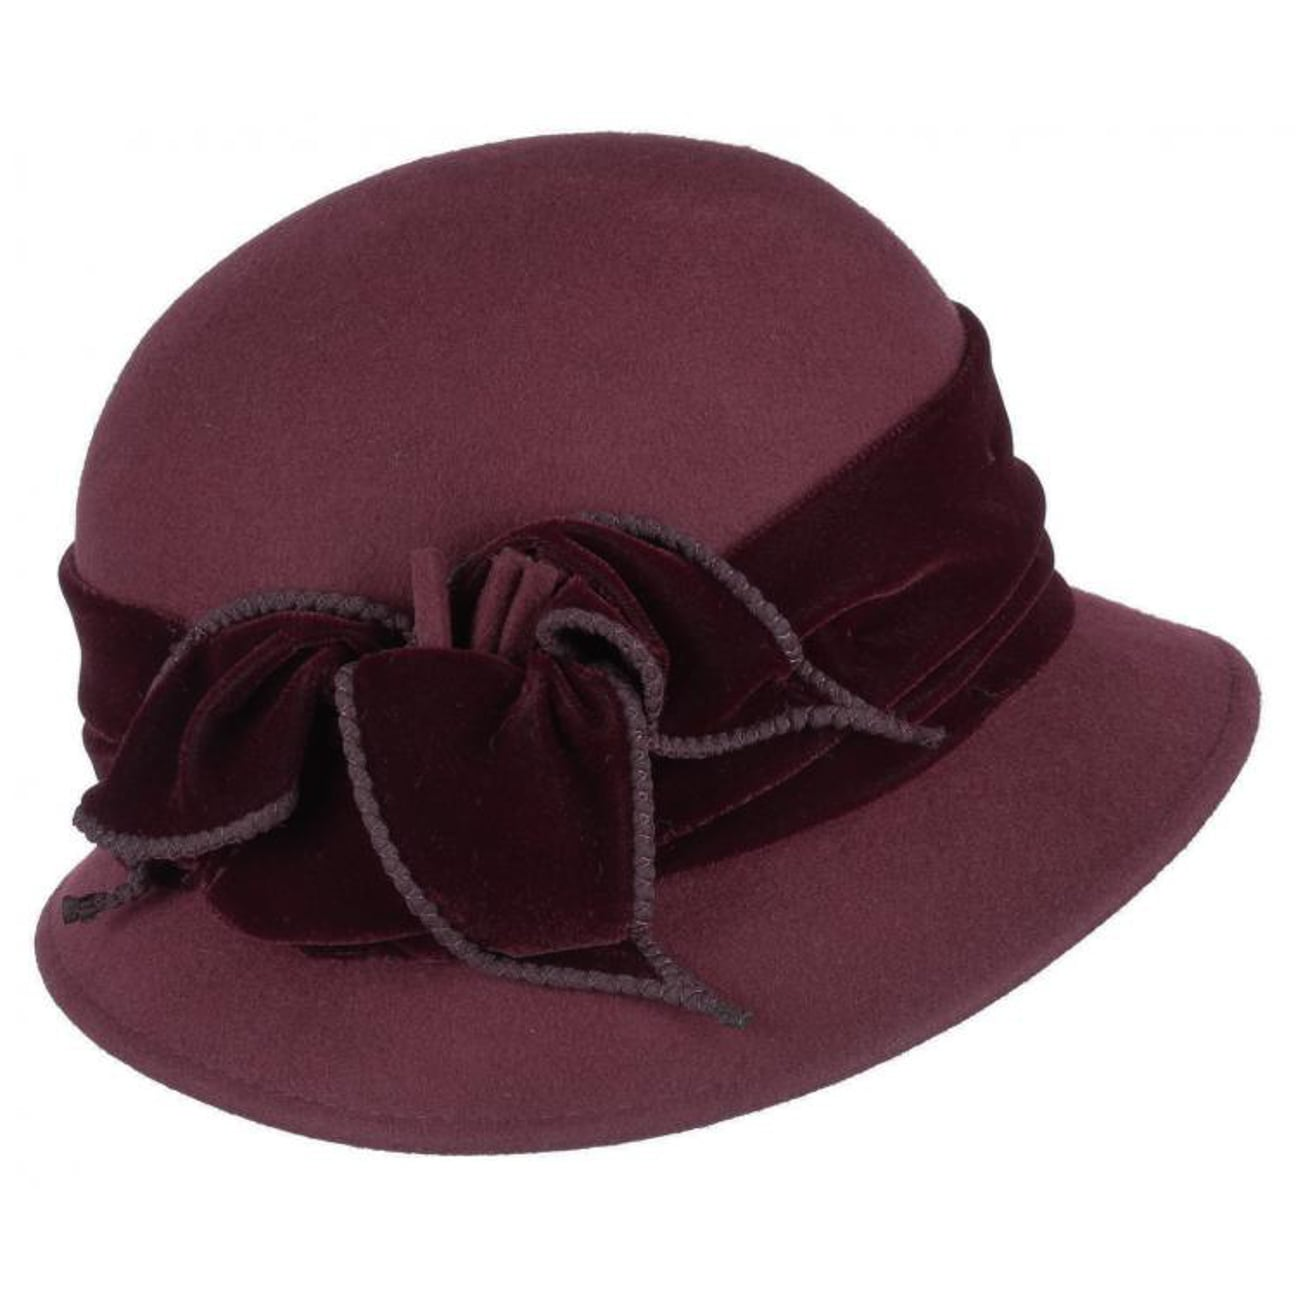 ... Sumare Cappello da Donna - rosso bordeaux 1 ... 2180379c19ac